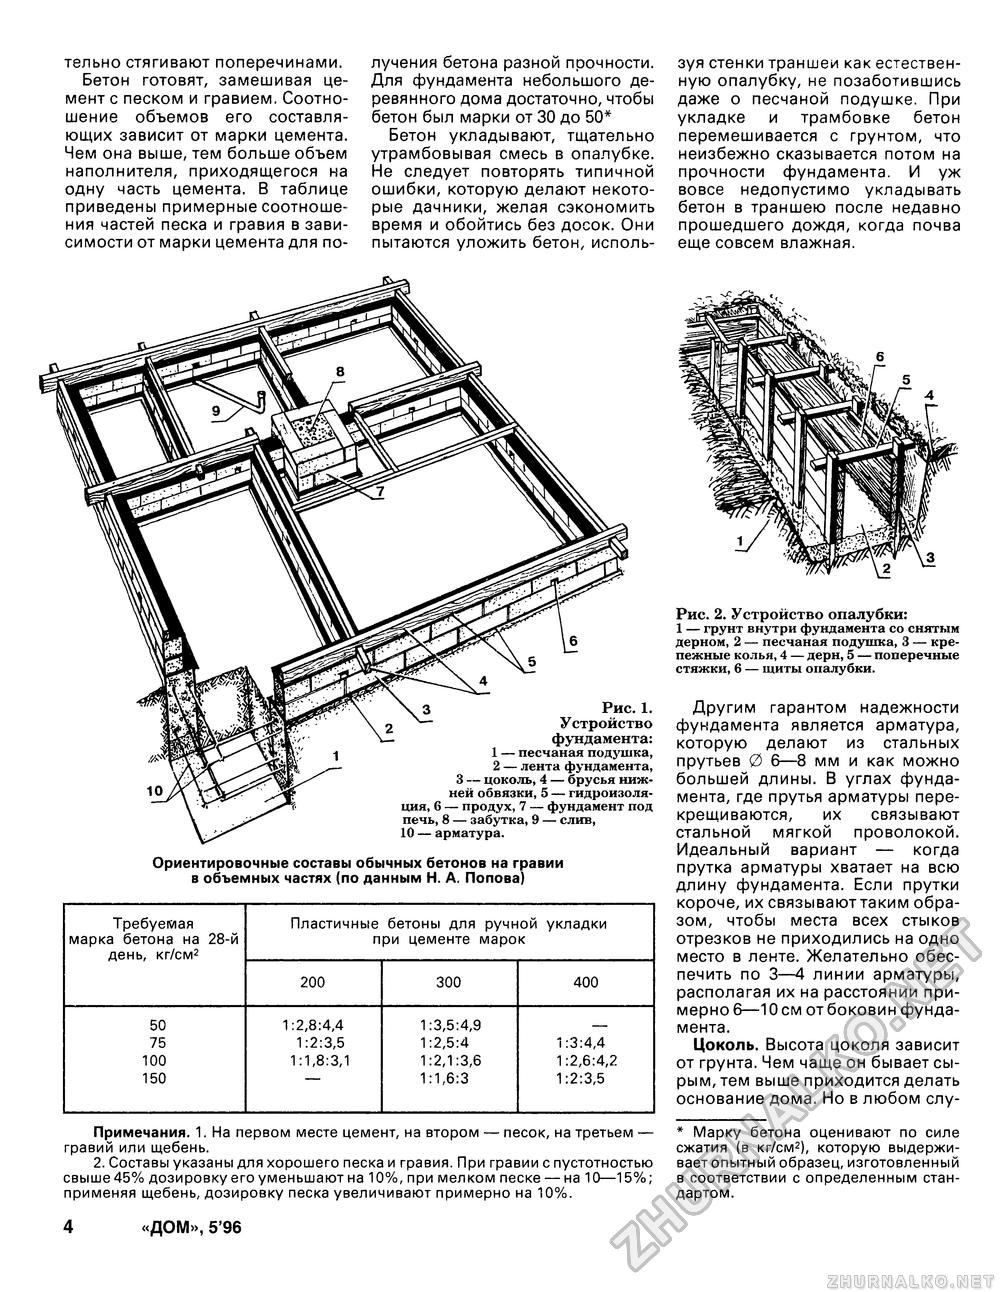 Как сделать бетон для фундамента: пропорции, заливка 558